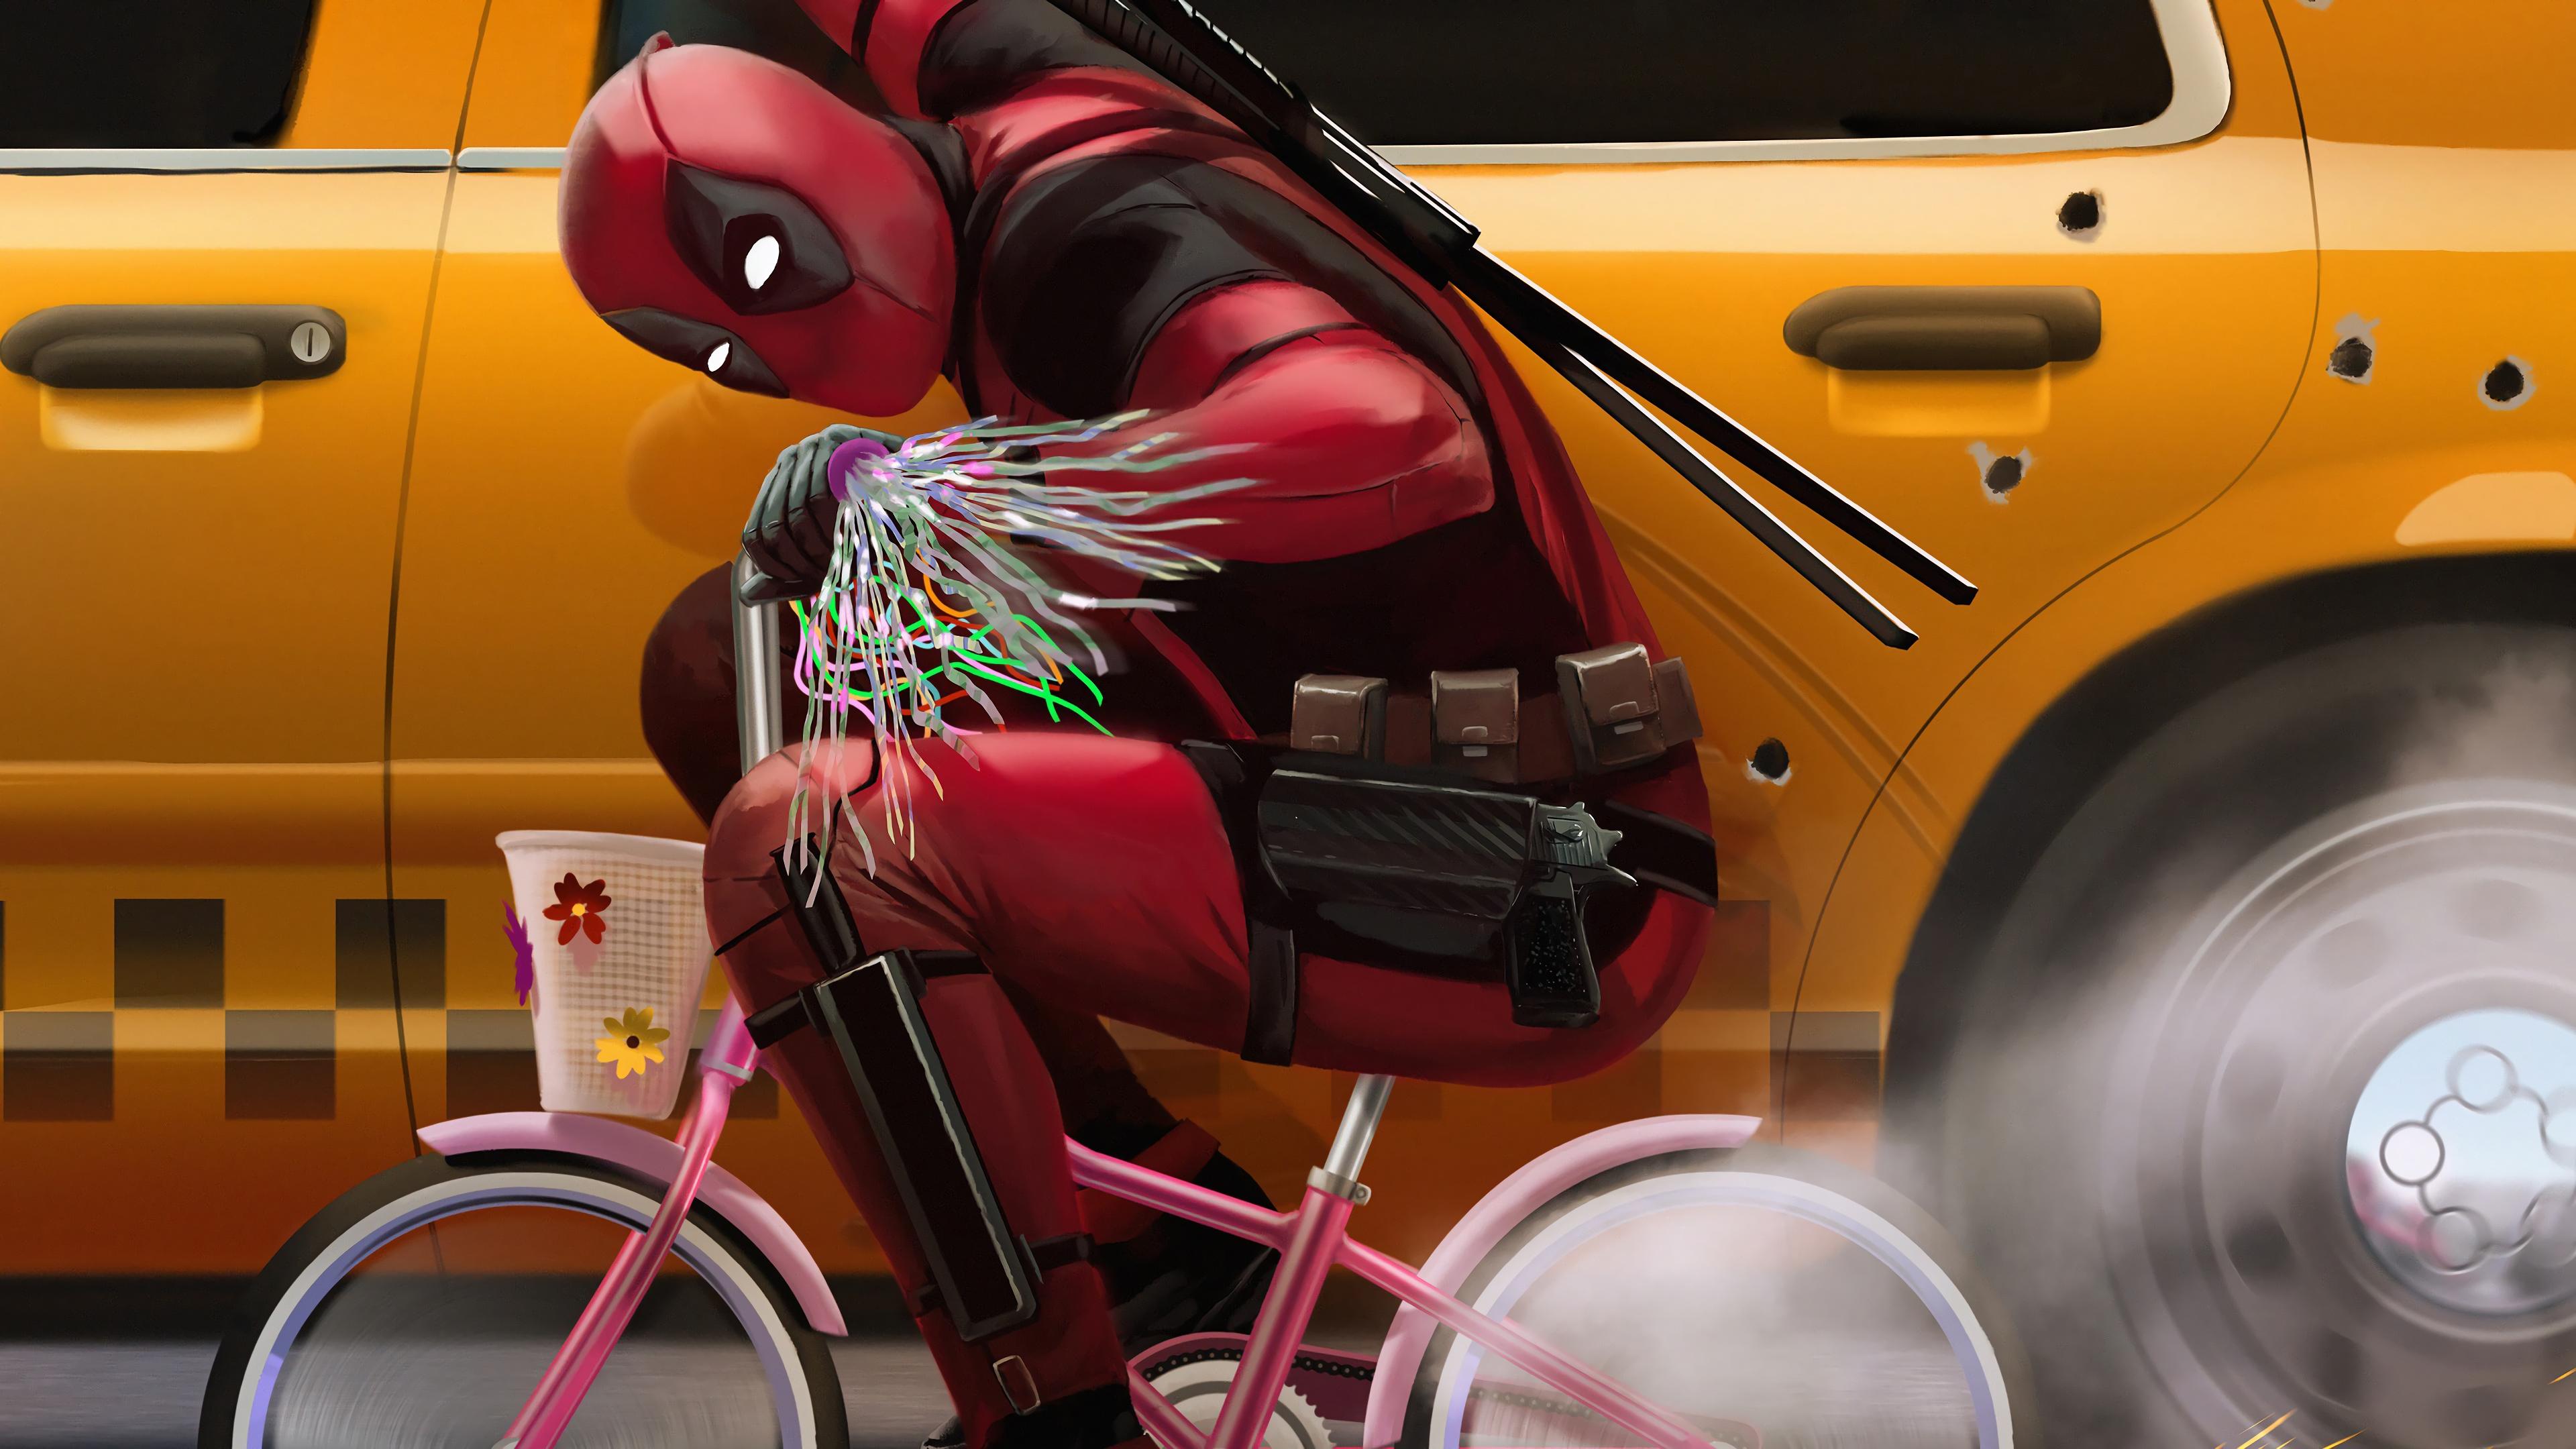 2048x2048 Deadpool 2 Movie Poster 4k Ipad Air Hd 4k: Deadpool Riding Bike Deadpool 2 Movie 4K Wallpaper